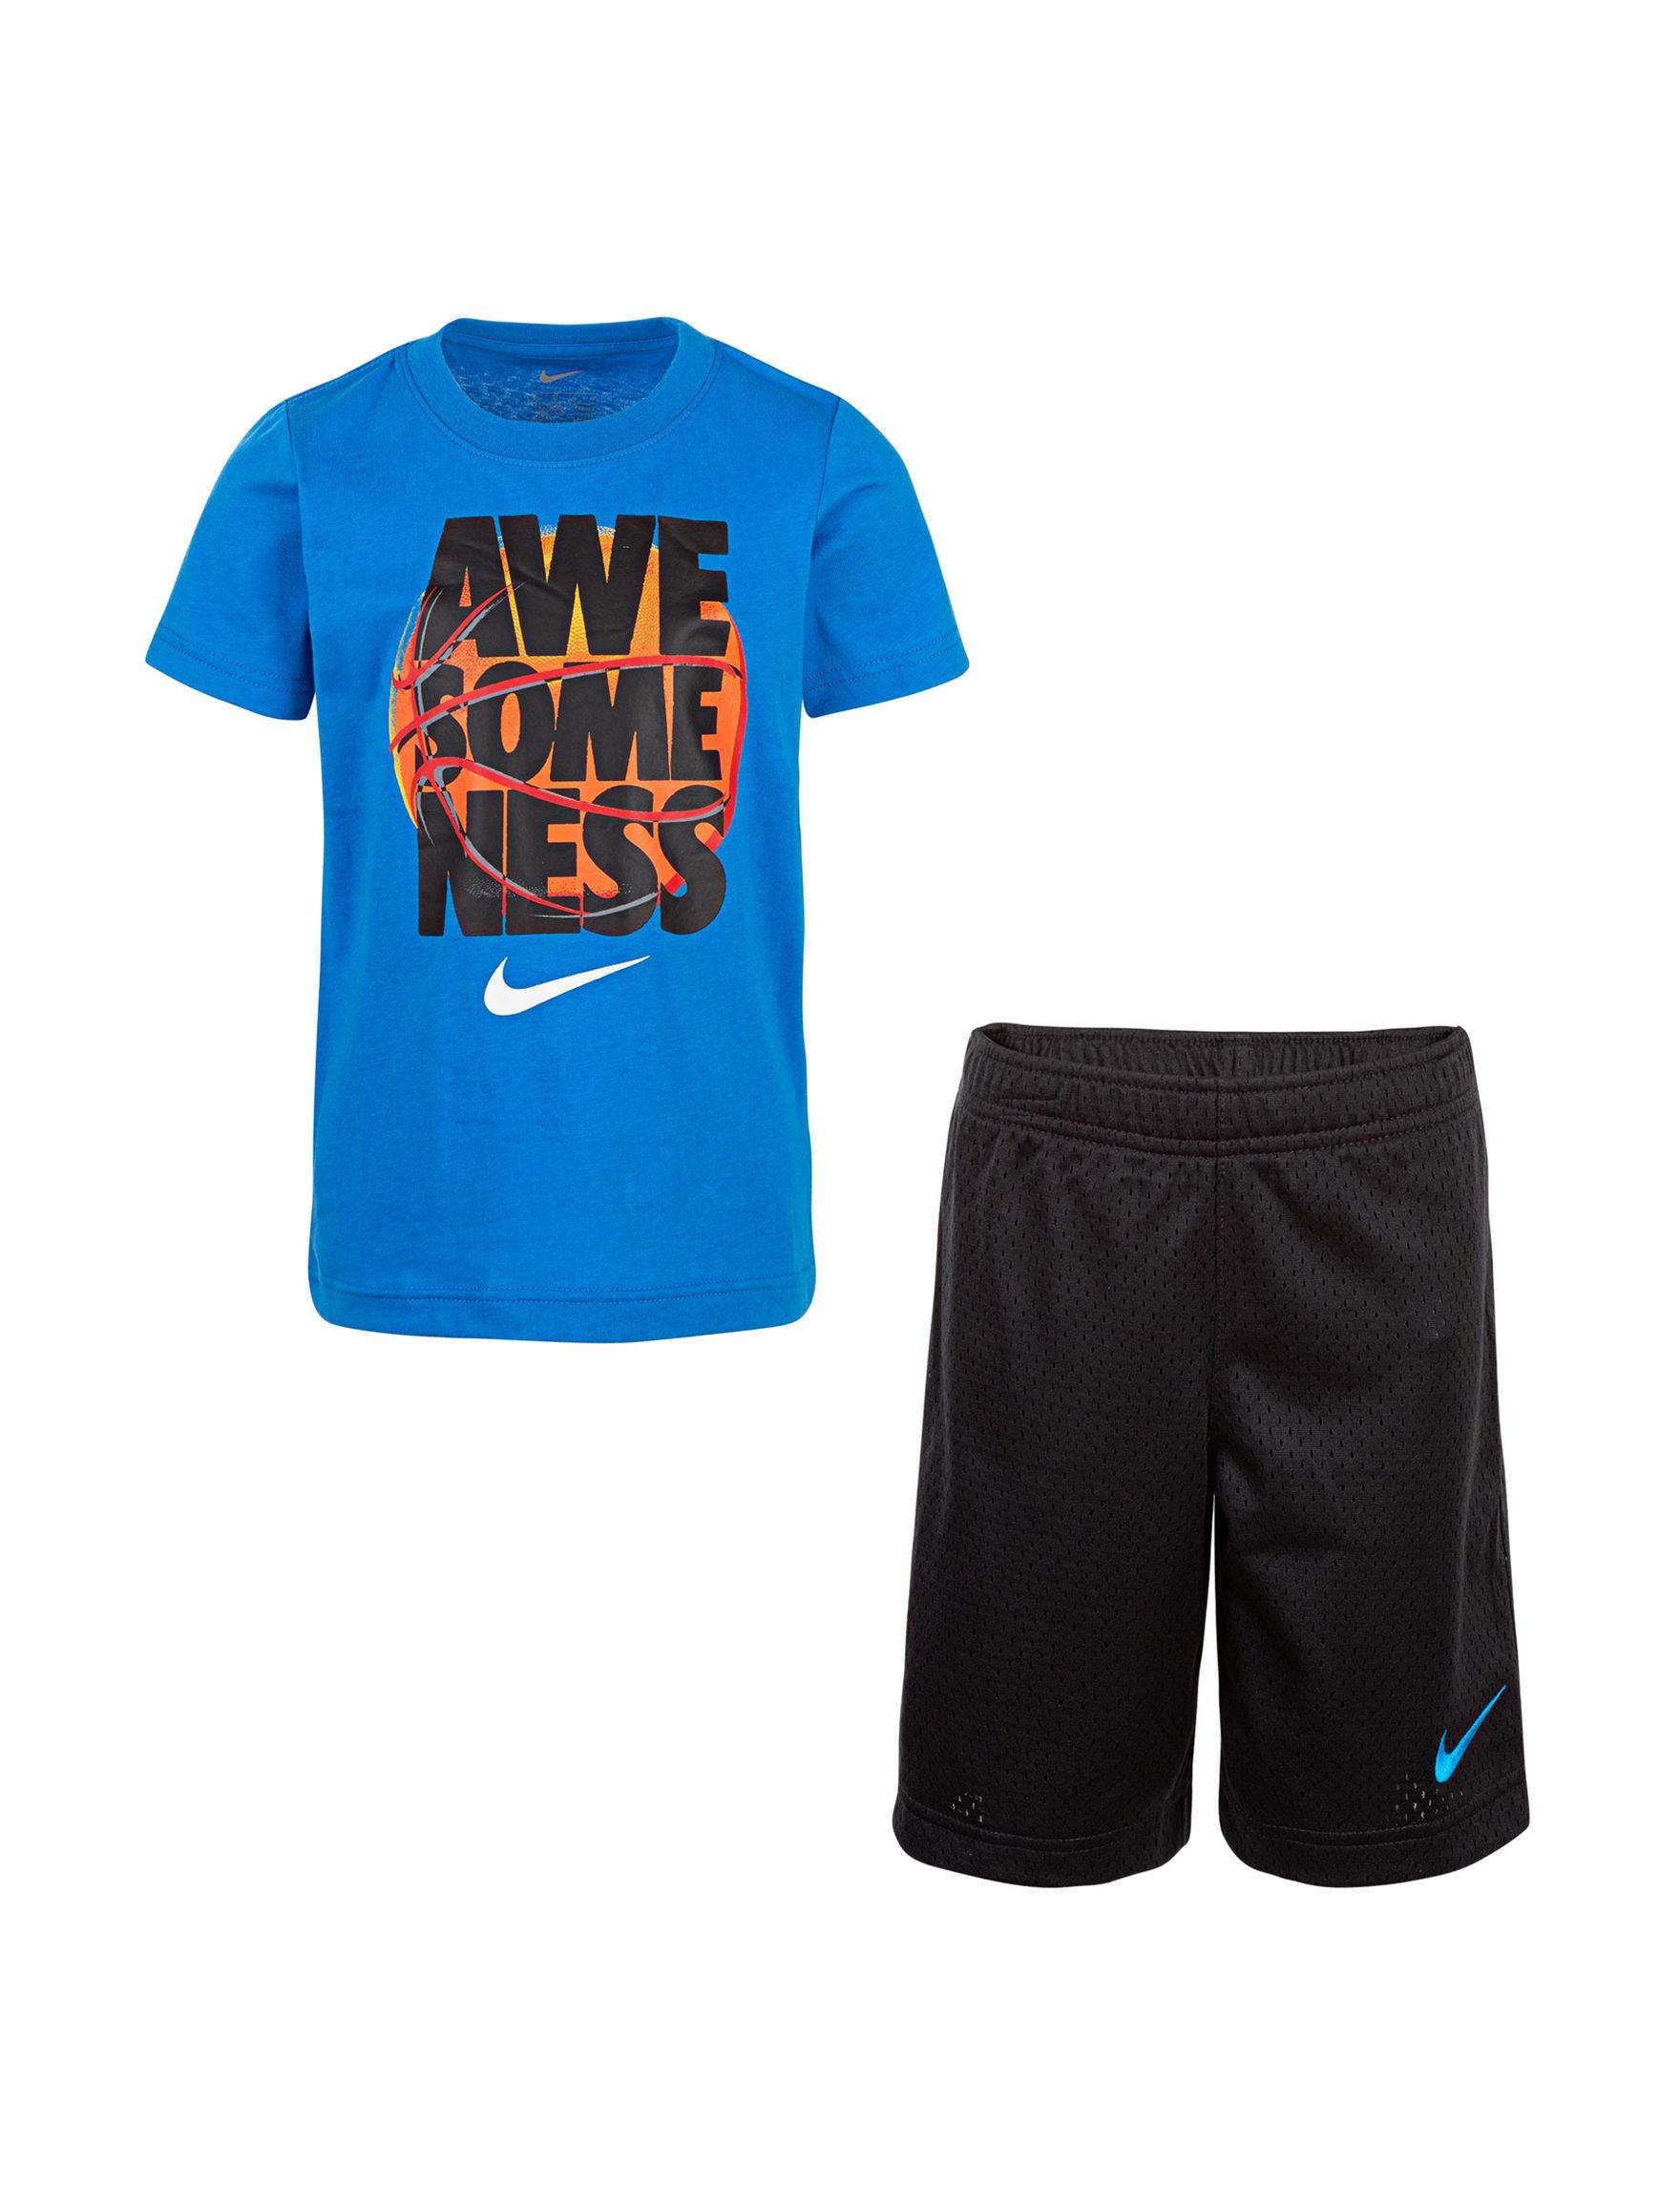 Nike Royal Blue / Black